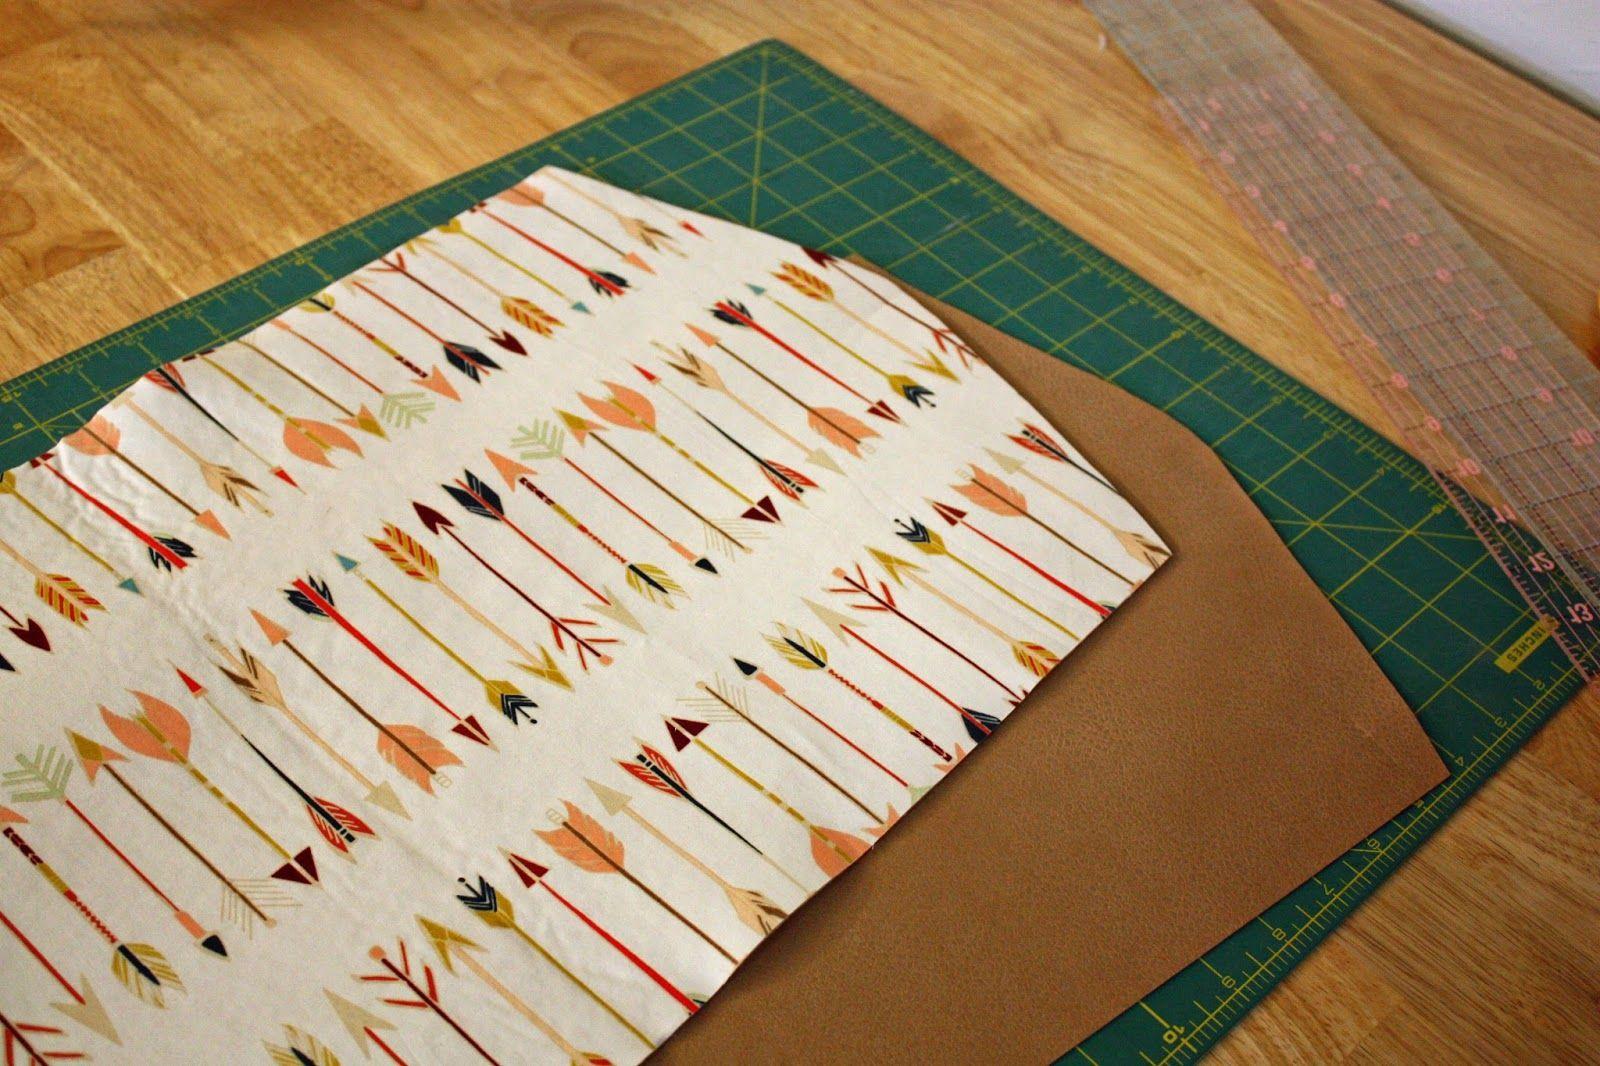 Fort Worth Fabric Studio Envelope Clutch Tutorial Clutch Tutorial Sewing Tutorials Bags Clutch Bag Pattern